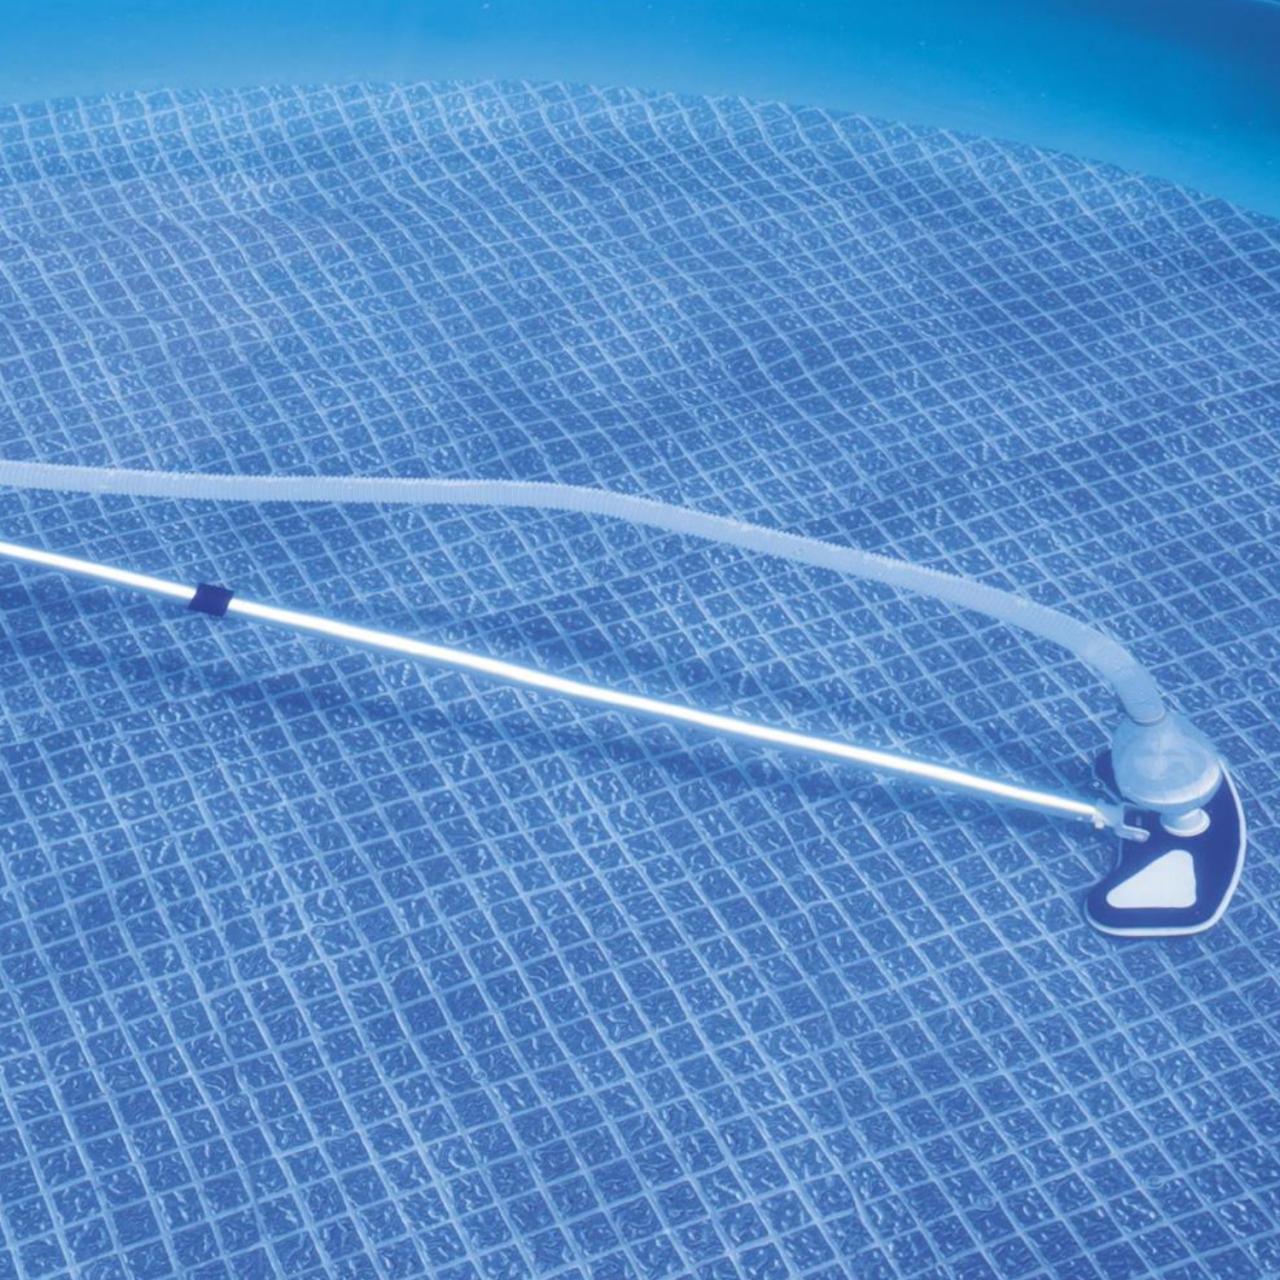 Bestway 58234 Flowclear Poolpflege Basis-Set Aquaclean pumpenbetriebenem Poolsauger + Kescher